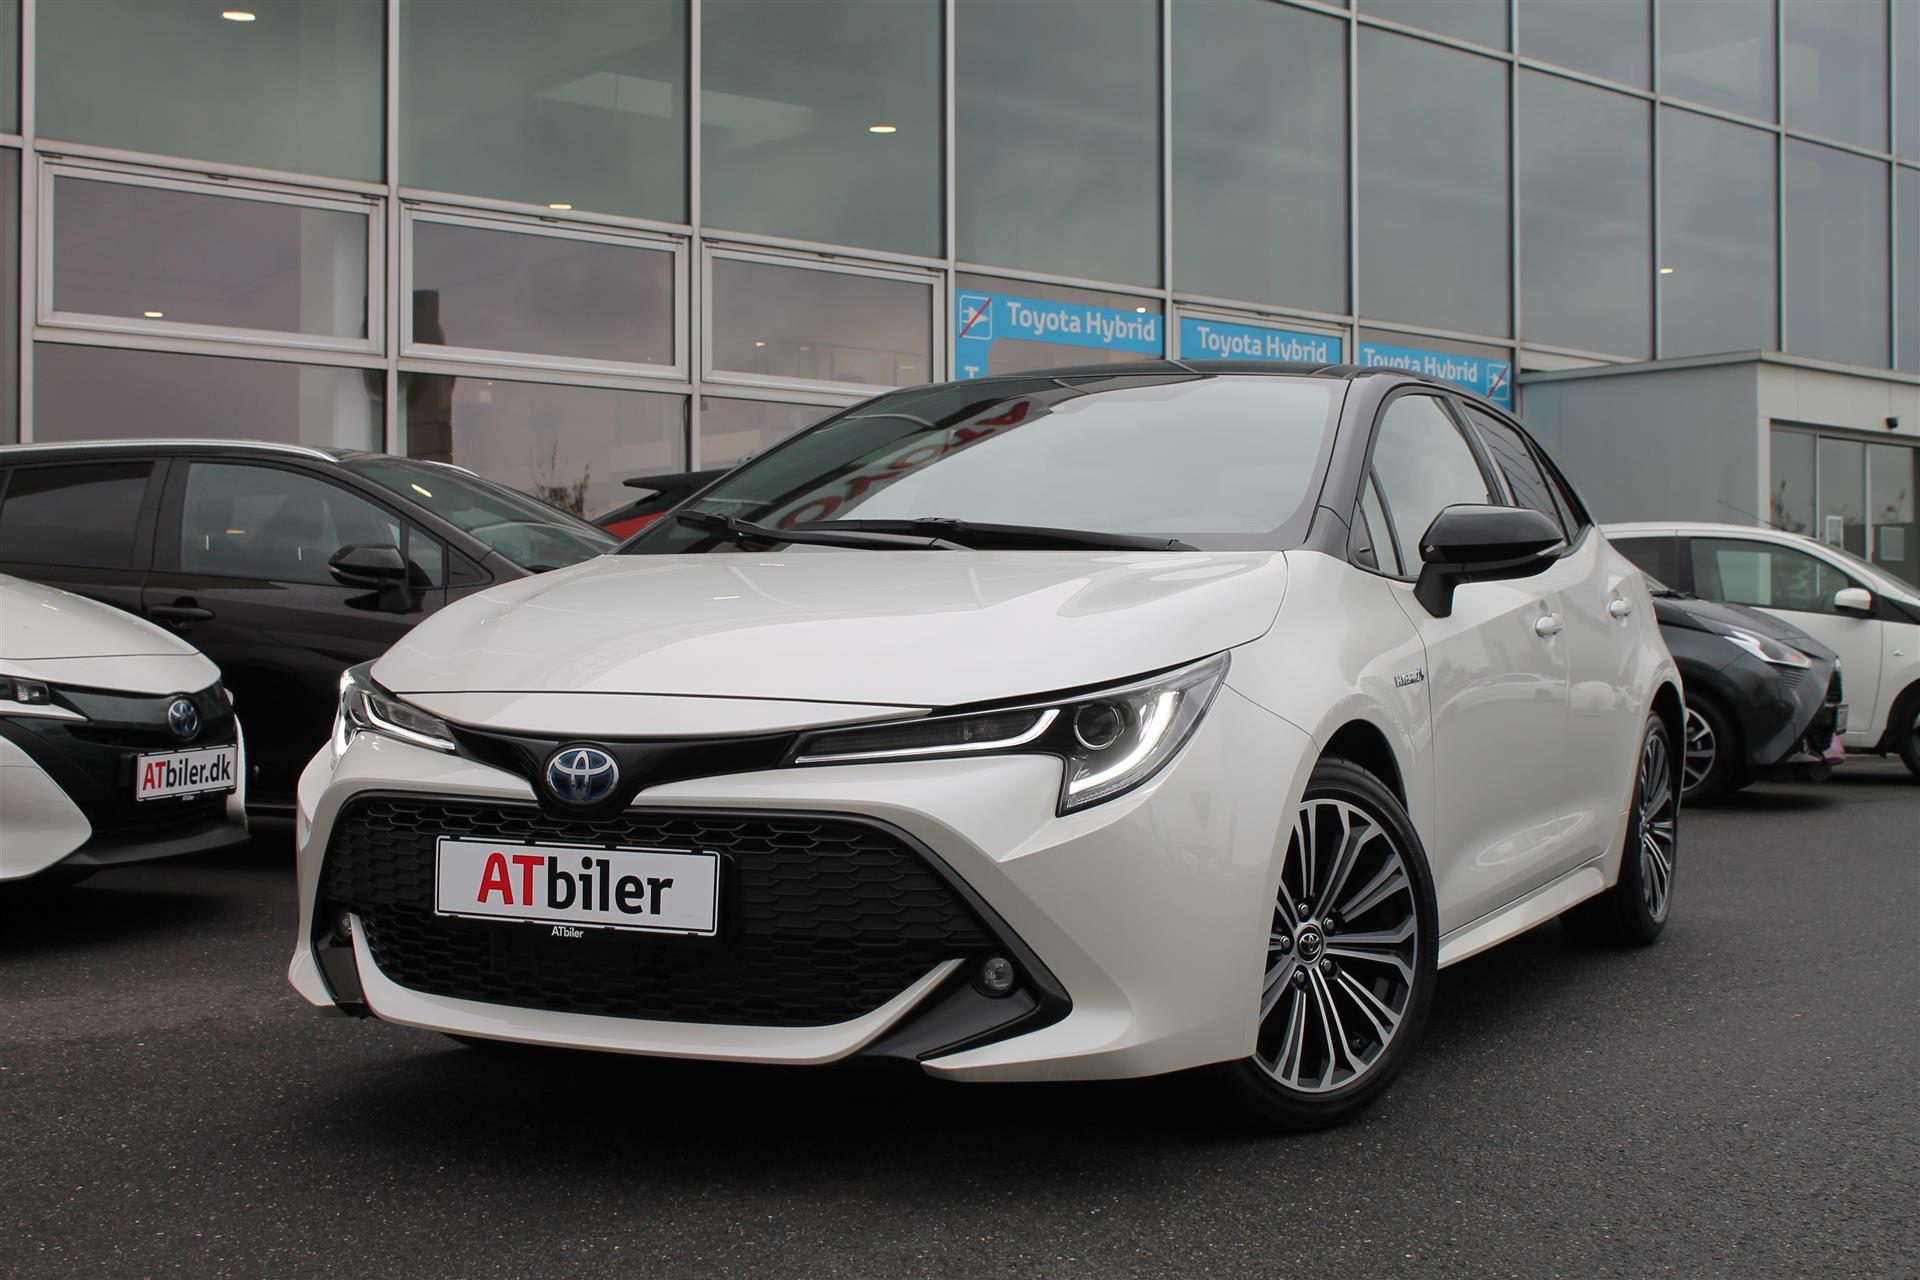 Billede af Toyota Corolla 2,0 B/EL H3 Premiumpakke E-CVT 180HK 5d 6g Aut.